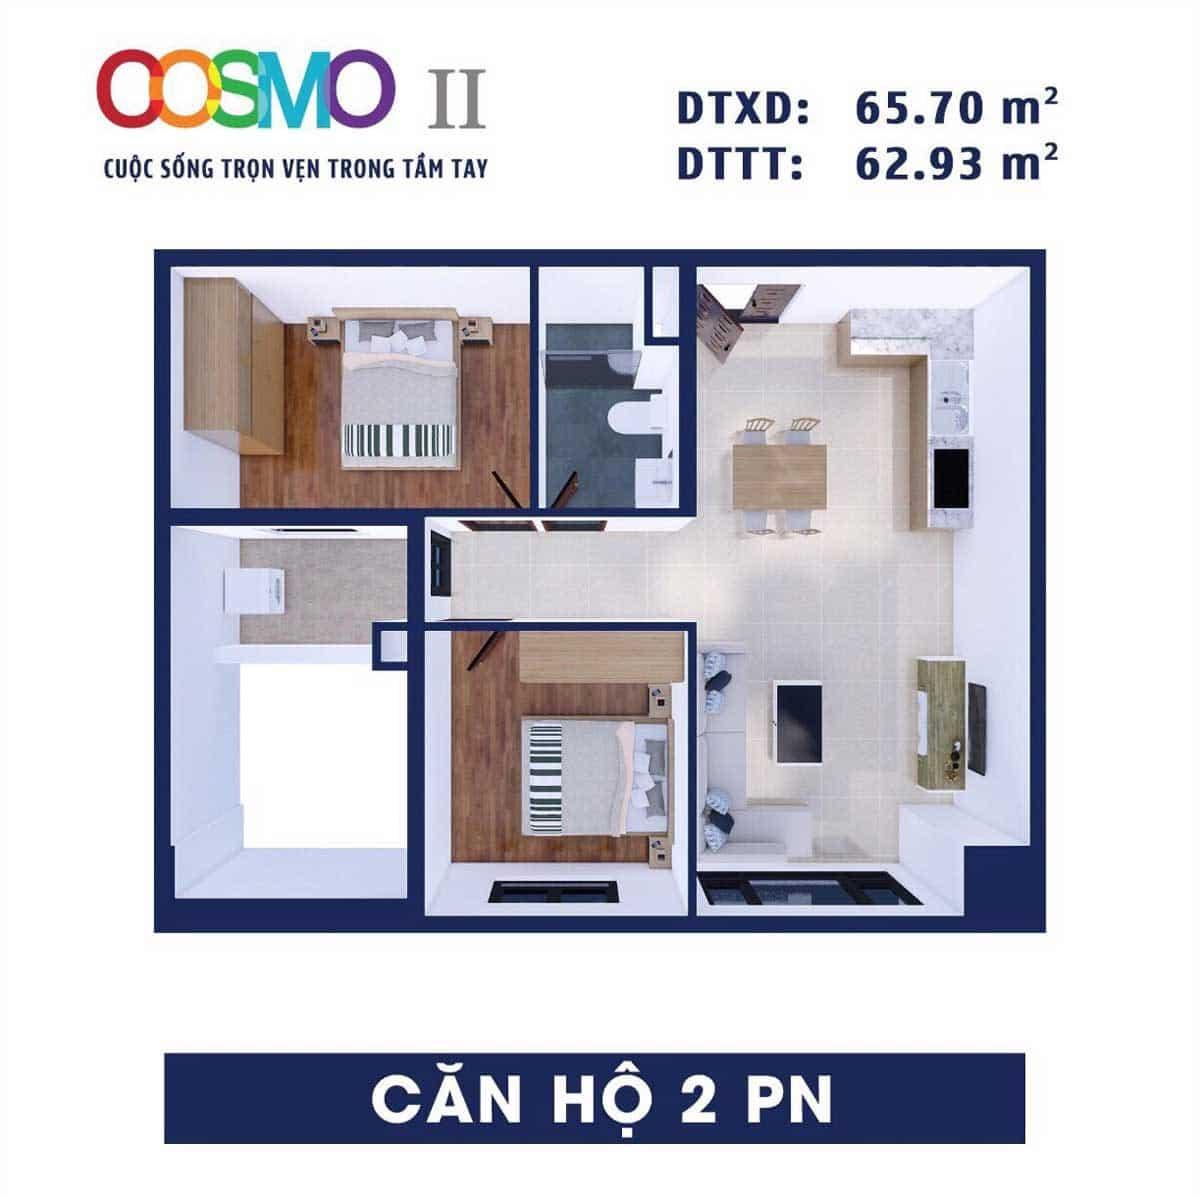 thiet-ke-can-ho-2-PN-dien-tich-65,70m2-cosmo-2